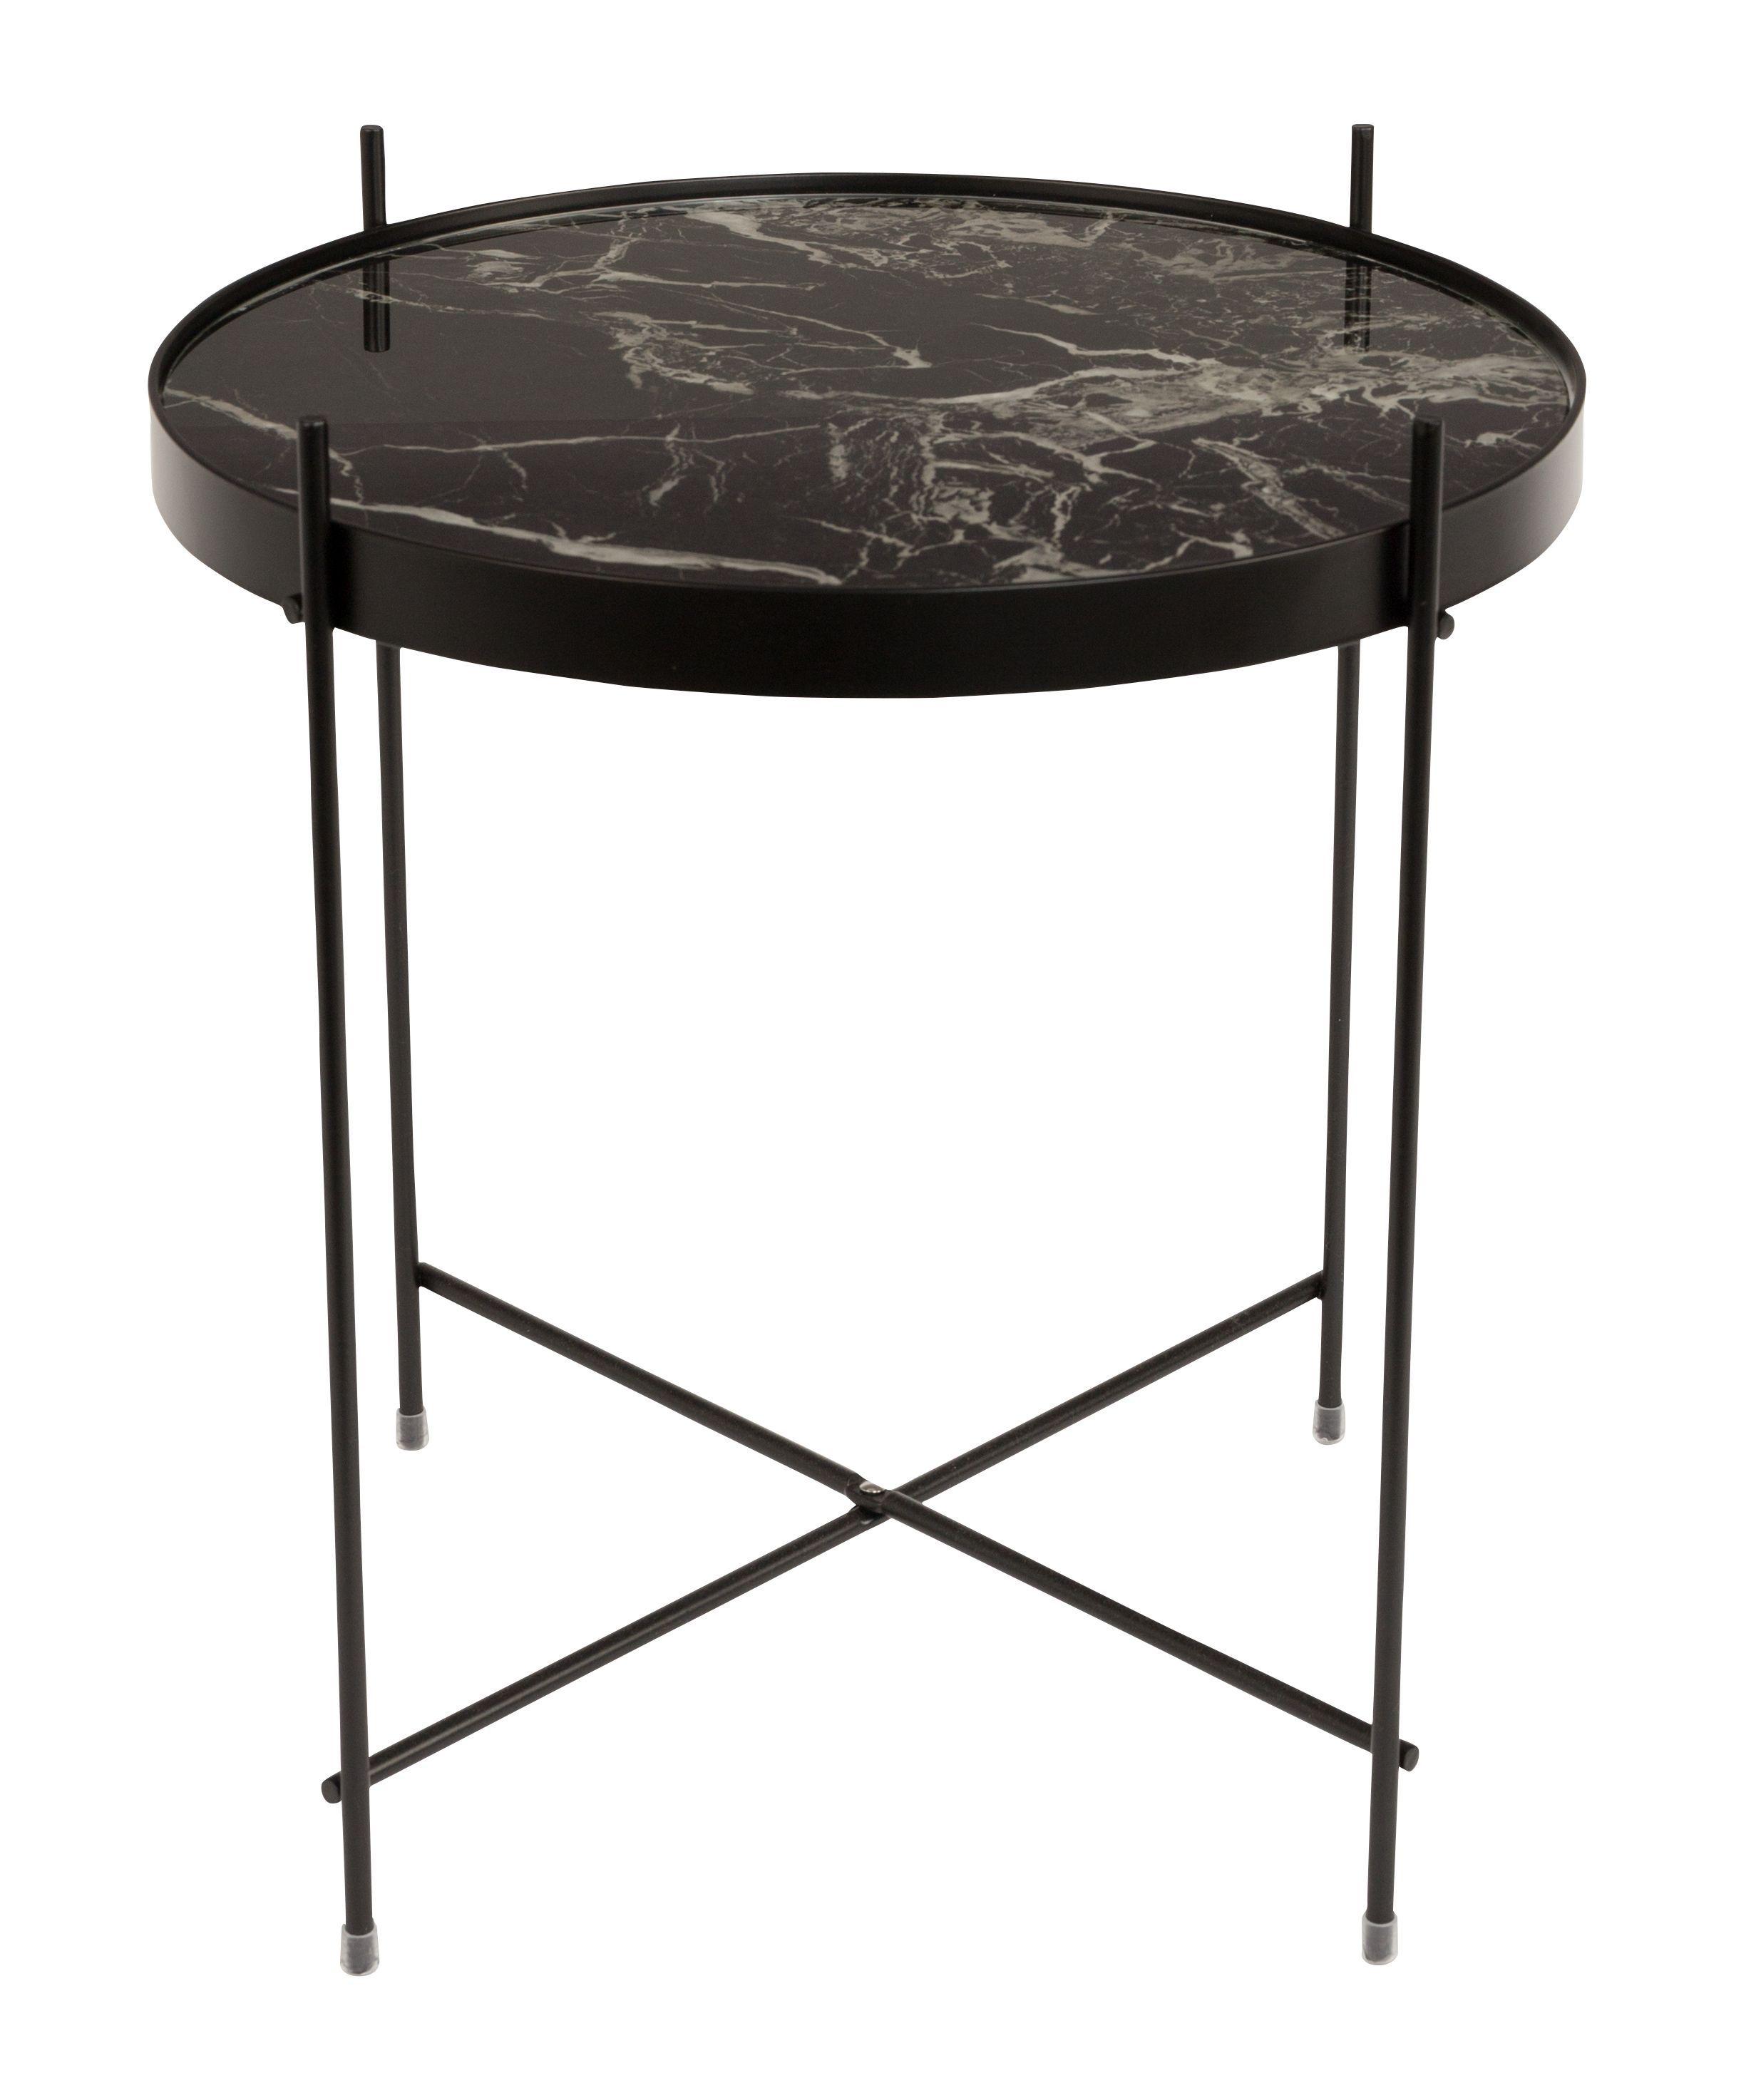 593fe5d4f434ab8a804c254140cf133f Luxe De Mini Table Basse Concept